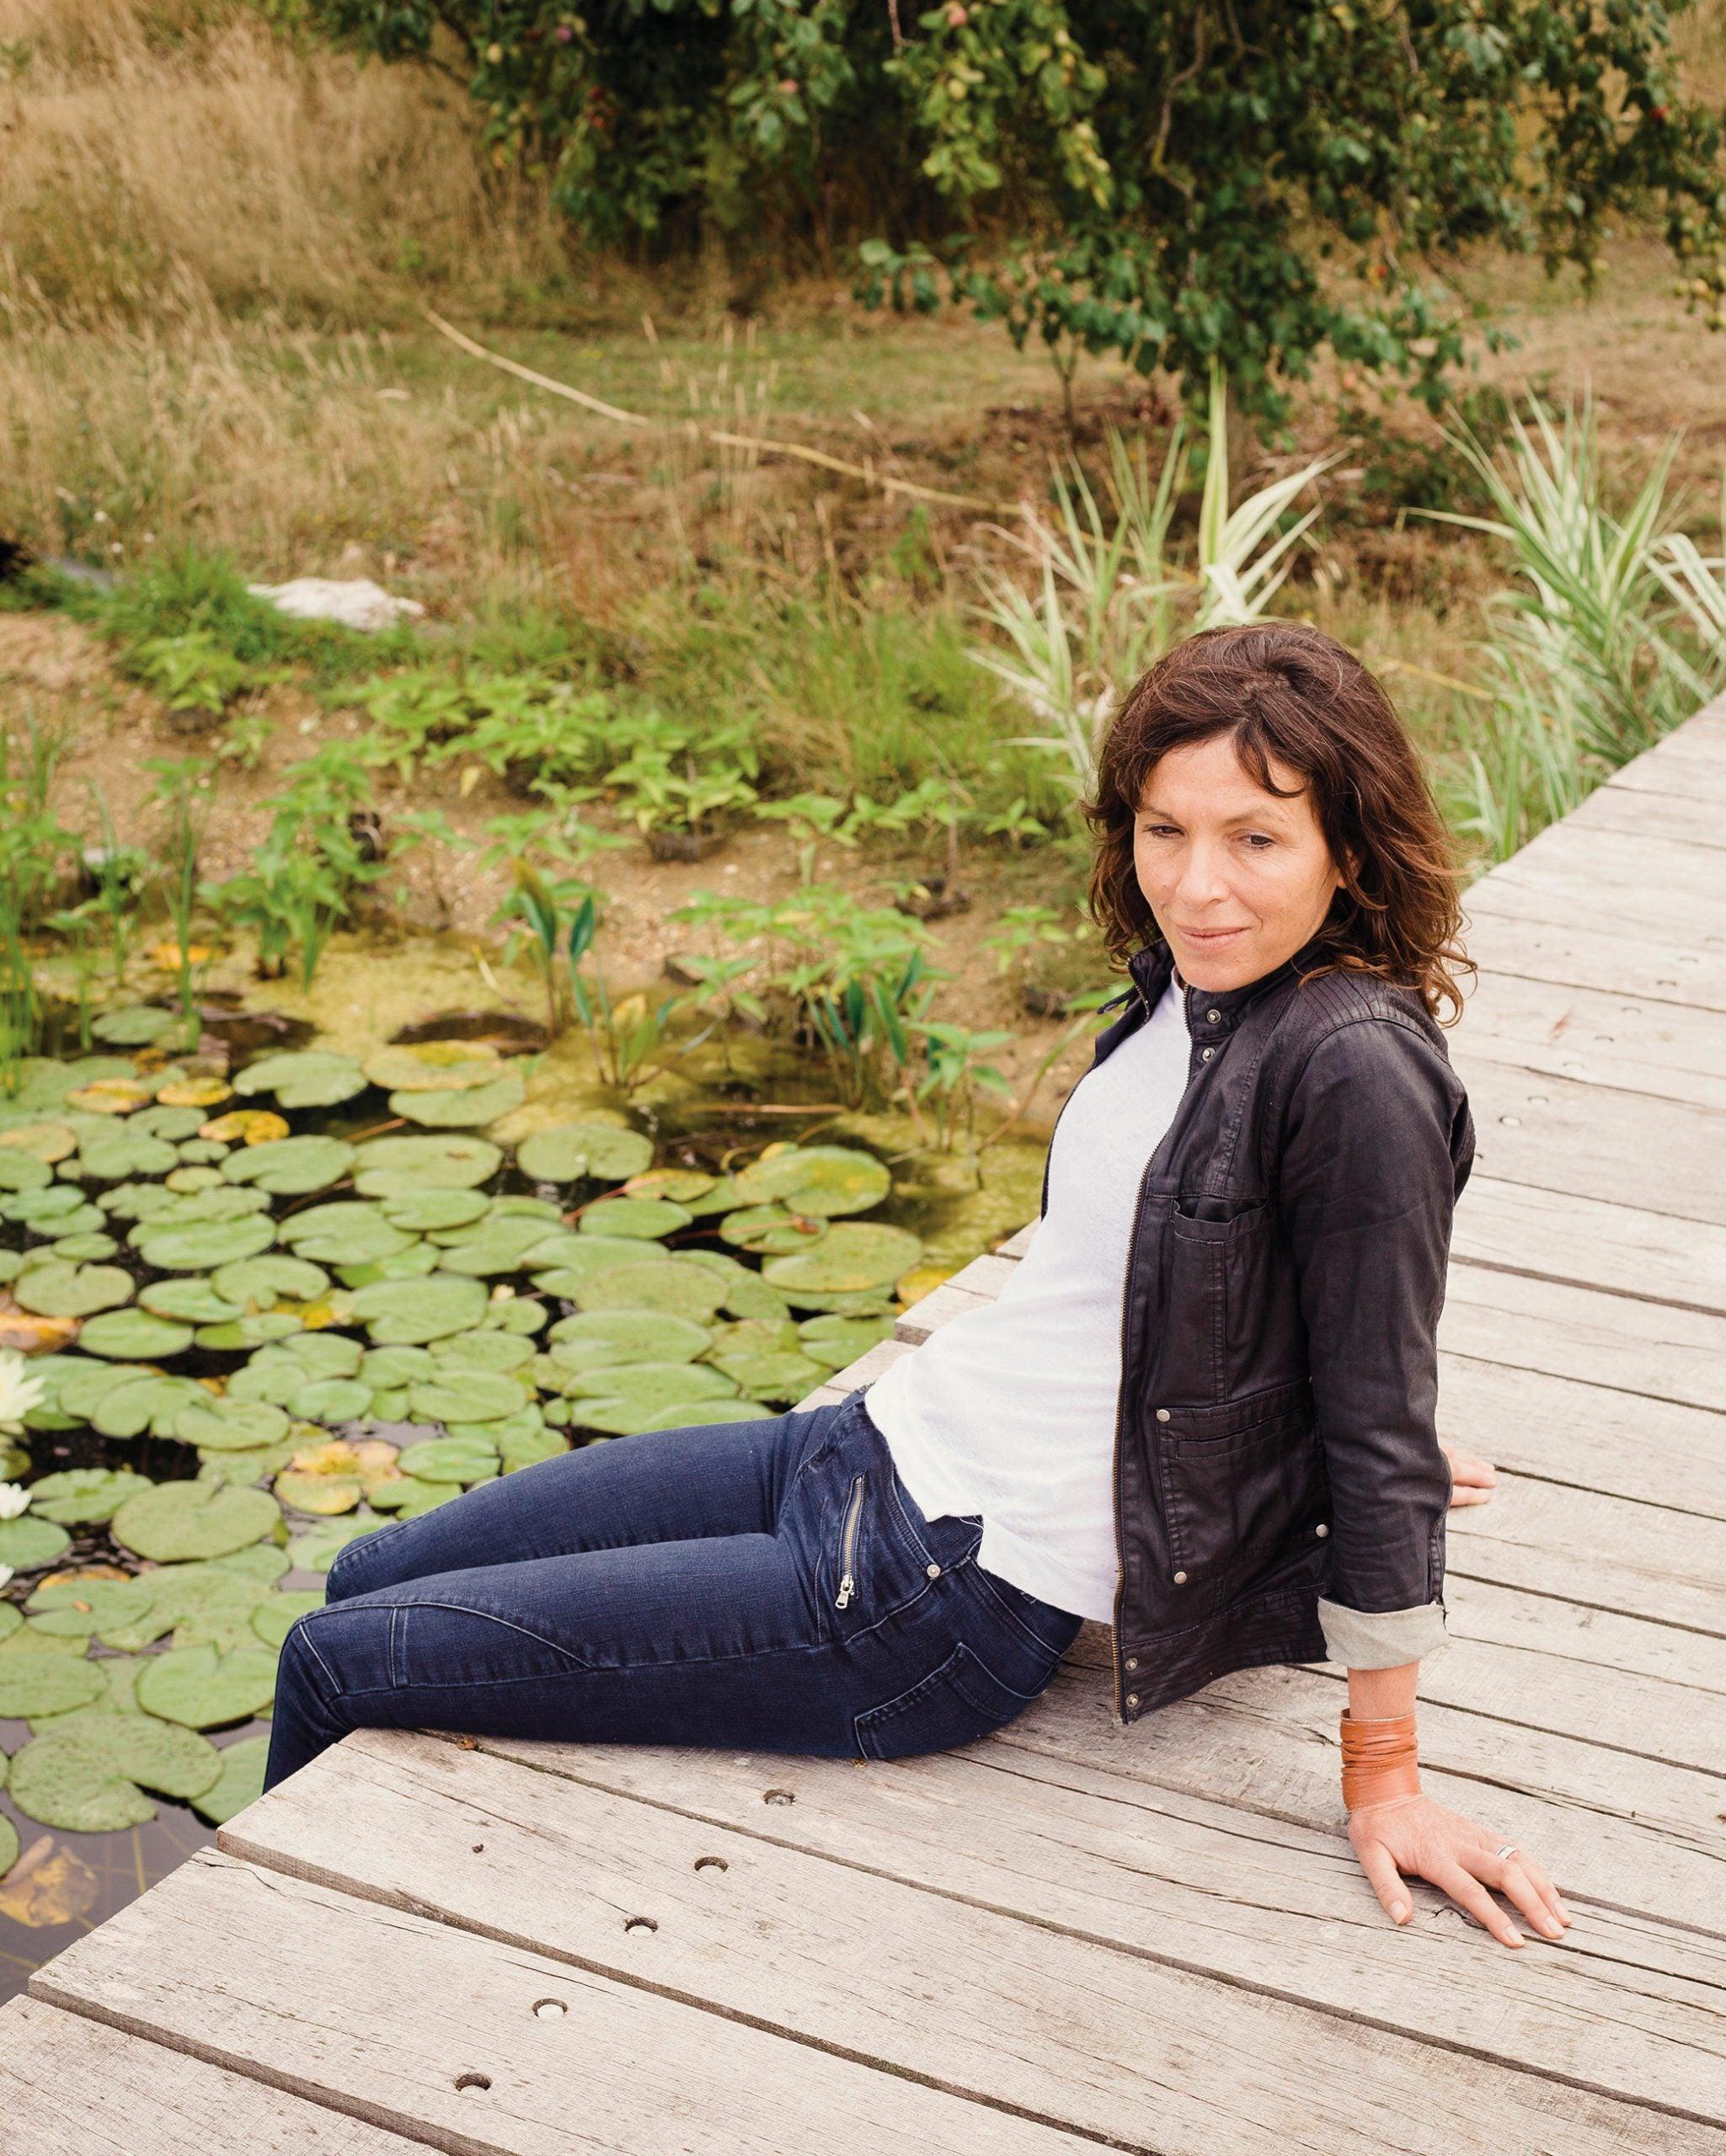 Rachel Cusk and the art of the midlife crisis